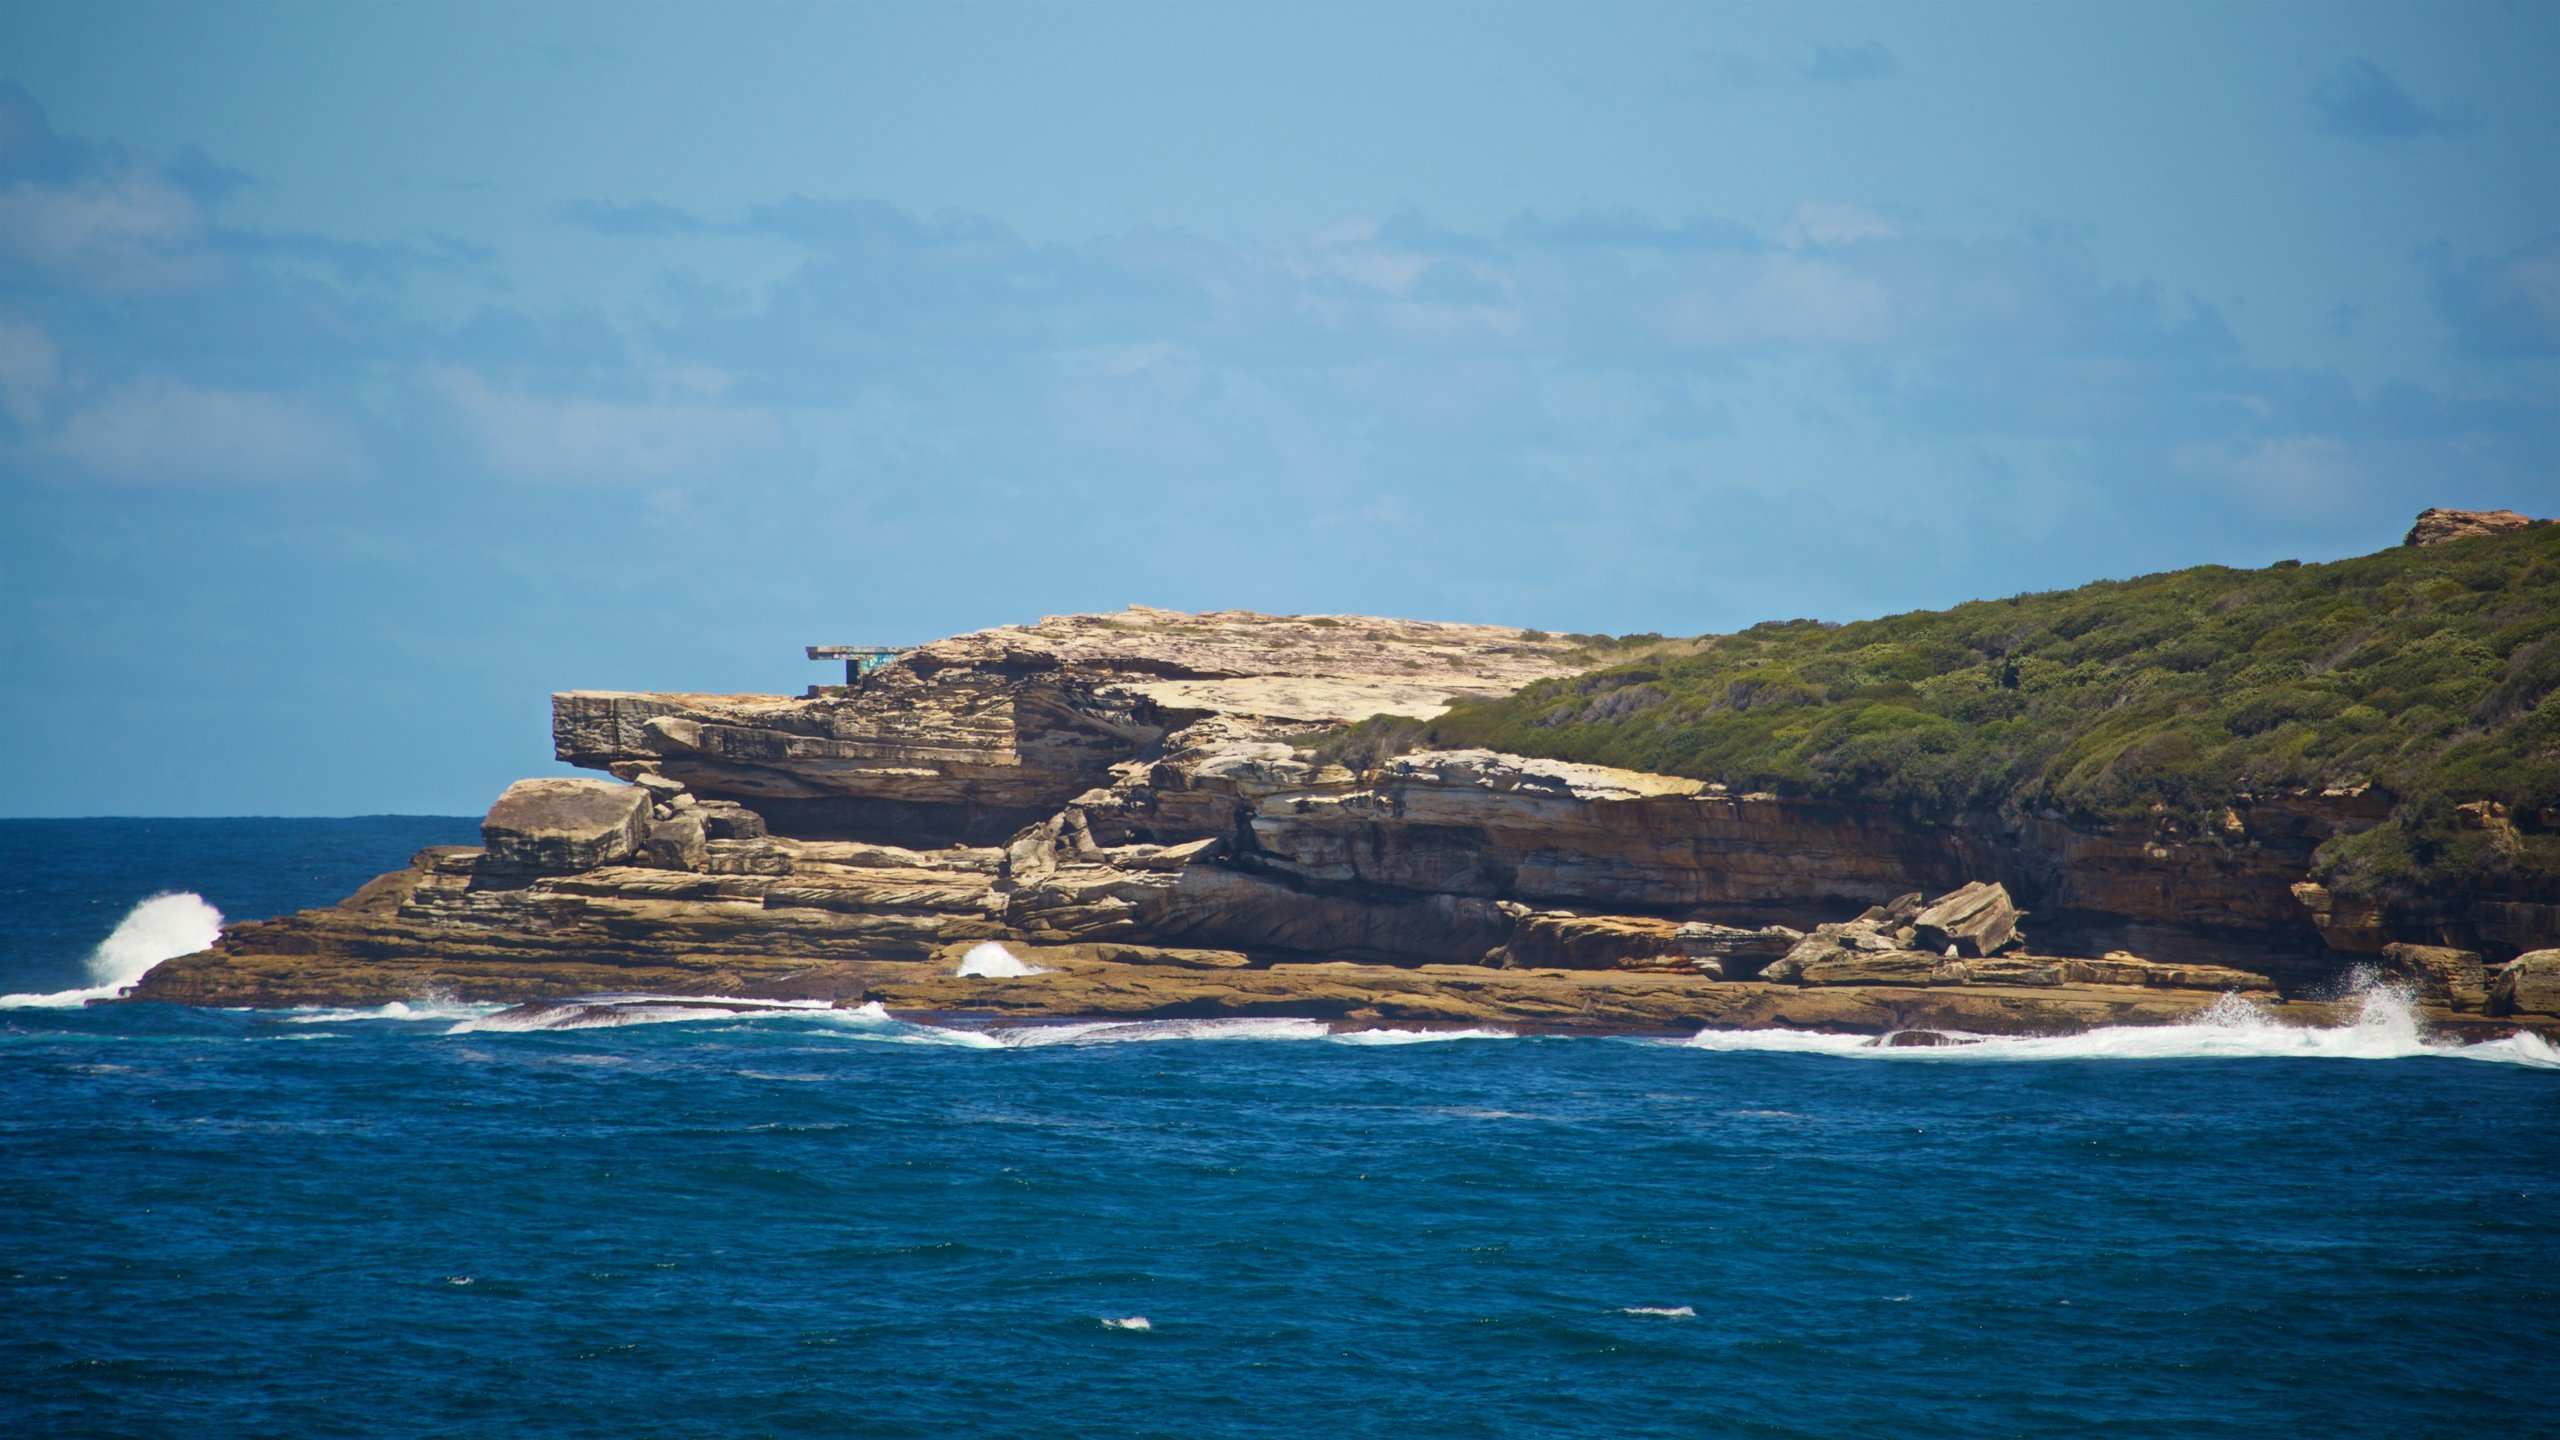 Maroubra Beach, Sydney, New South Wales, Australia